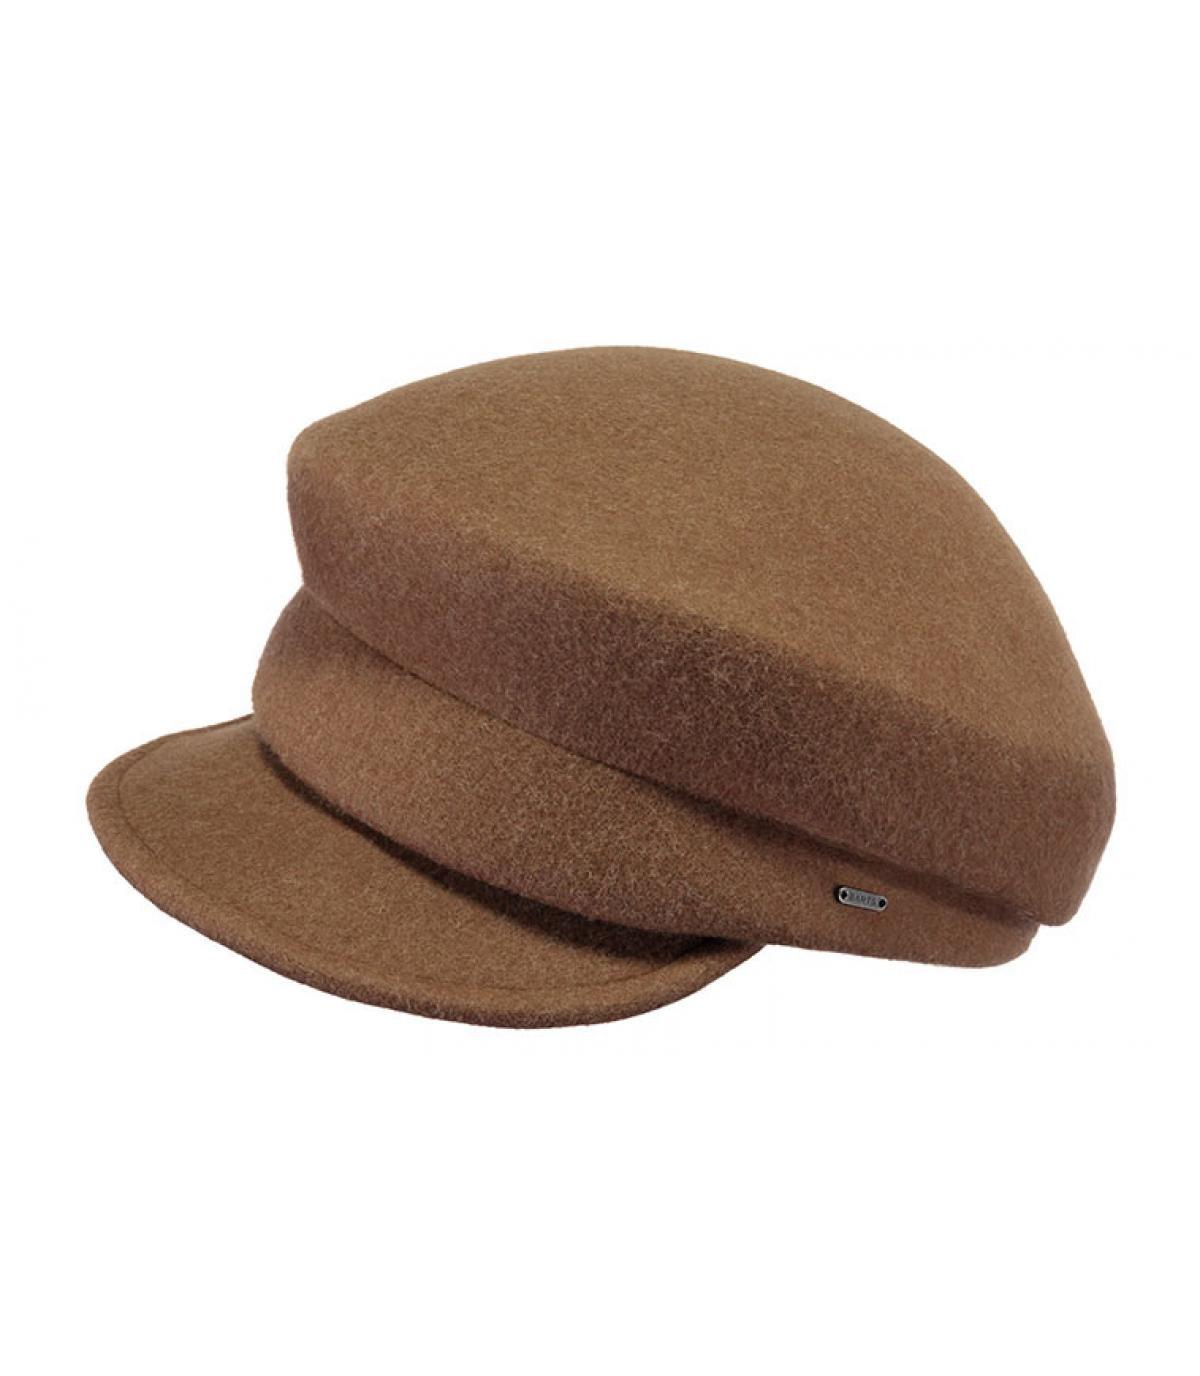 bruine wol baret